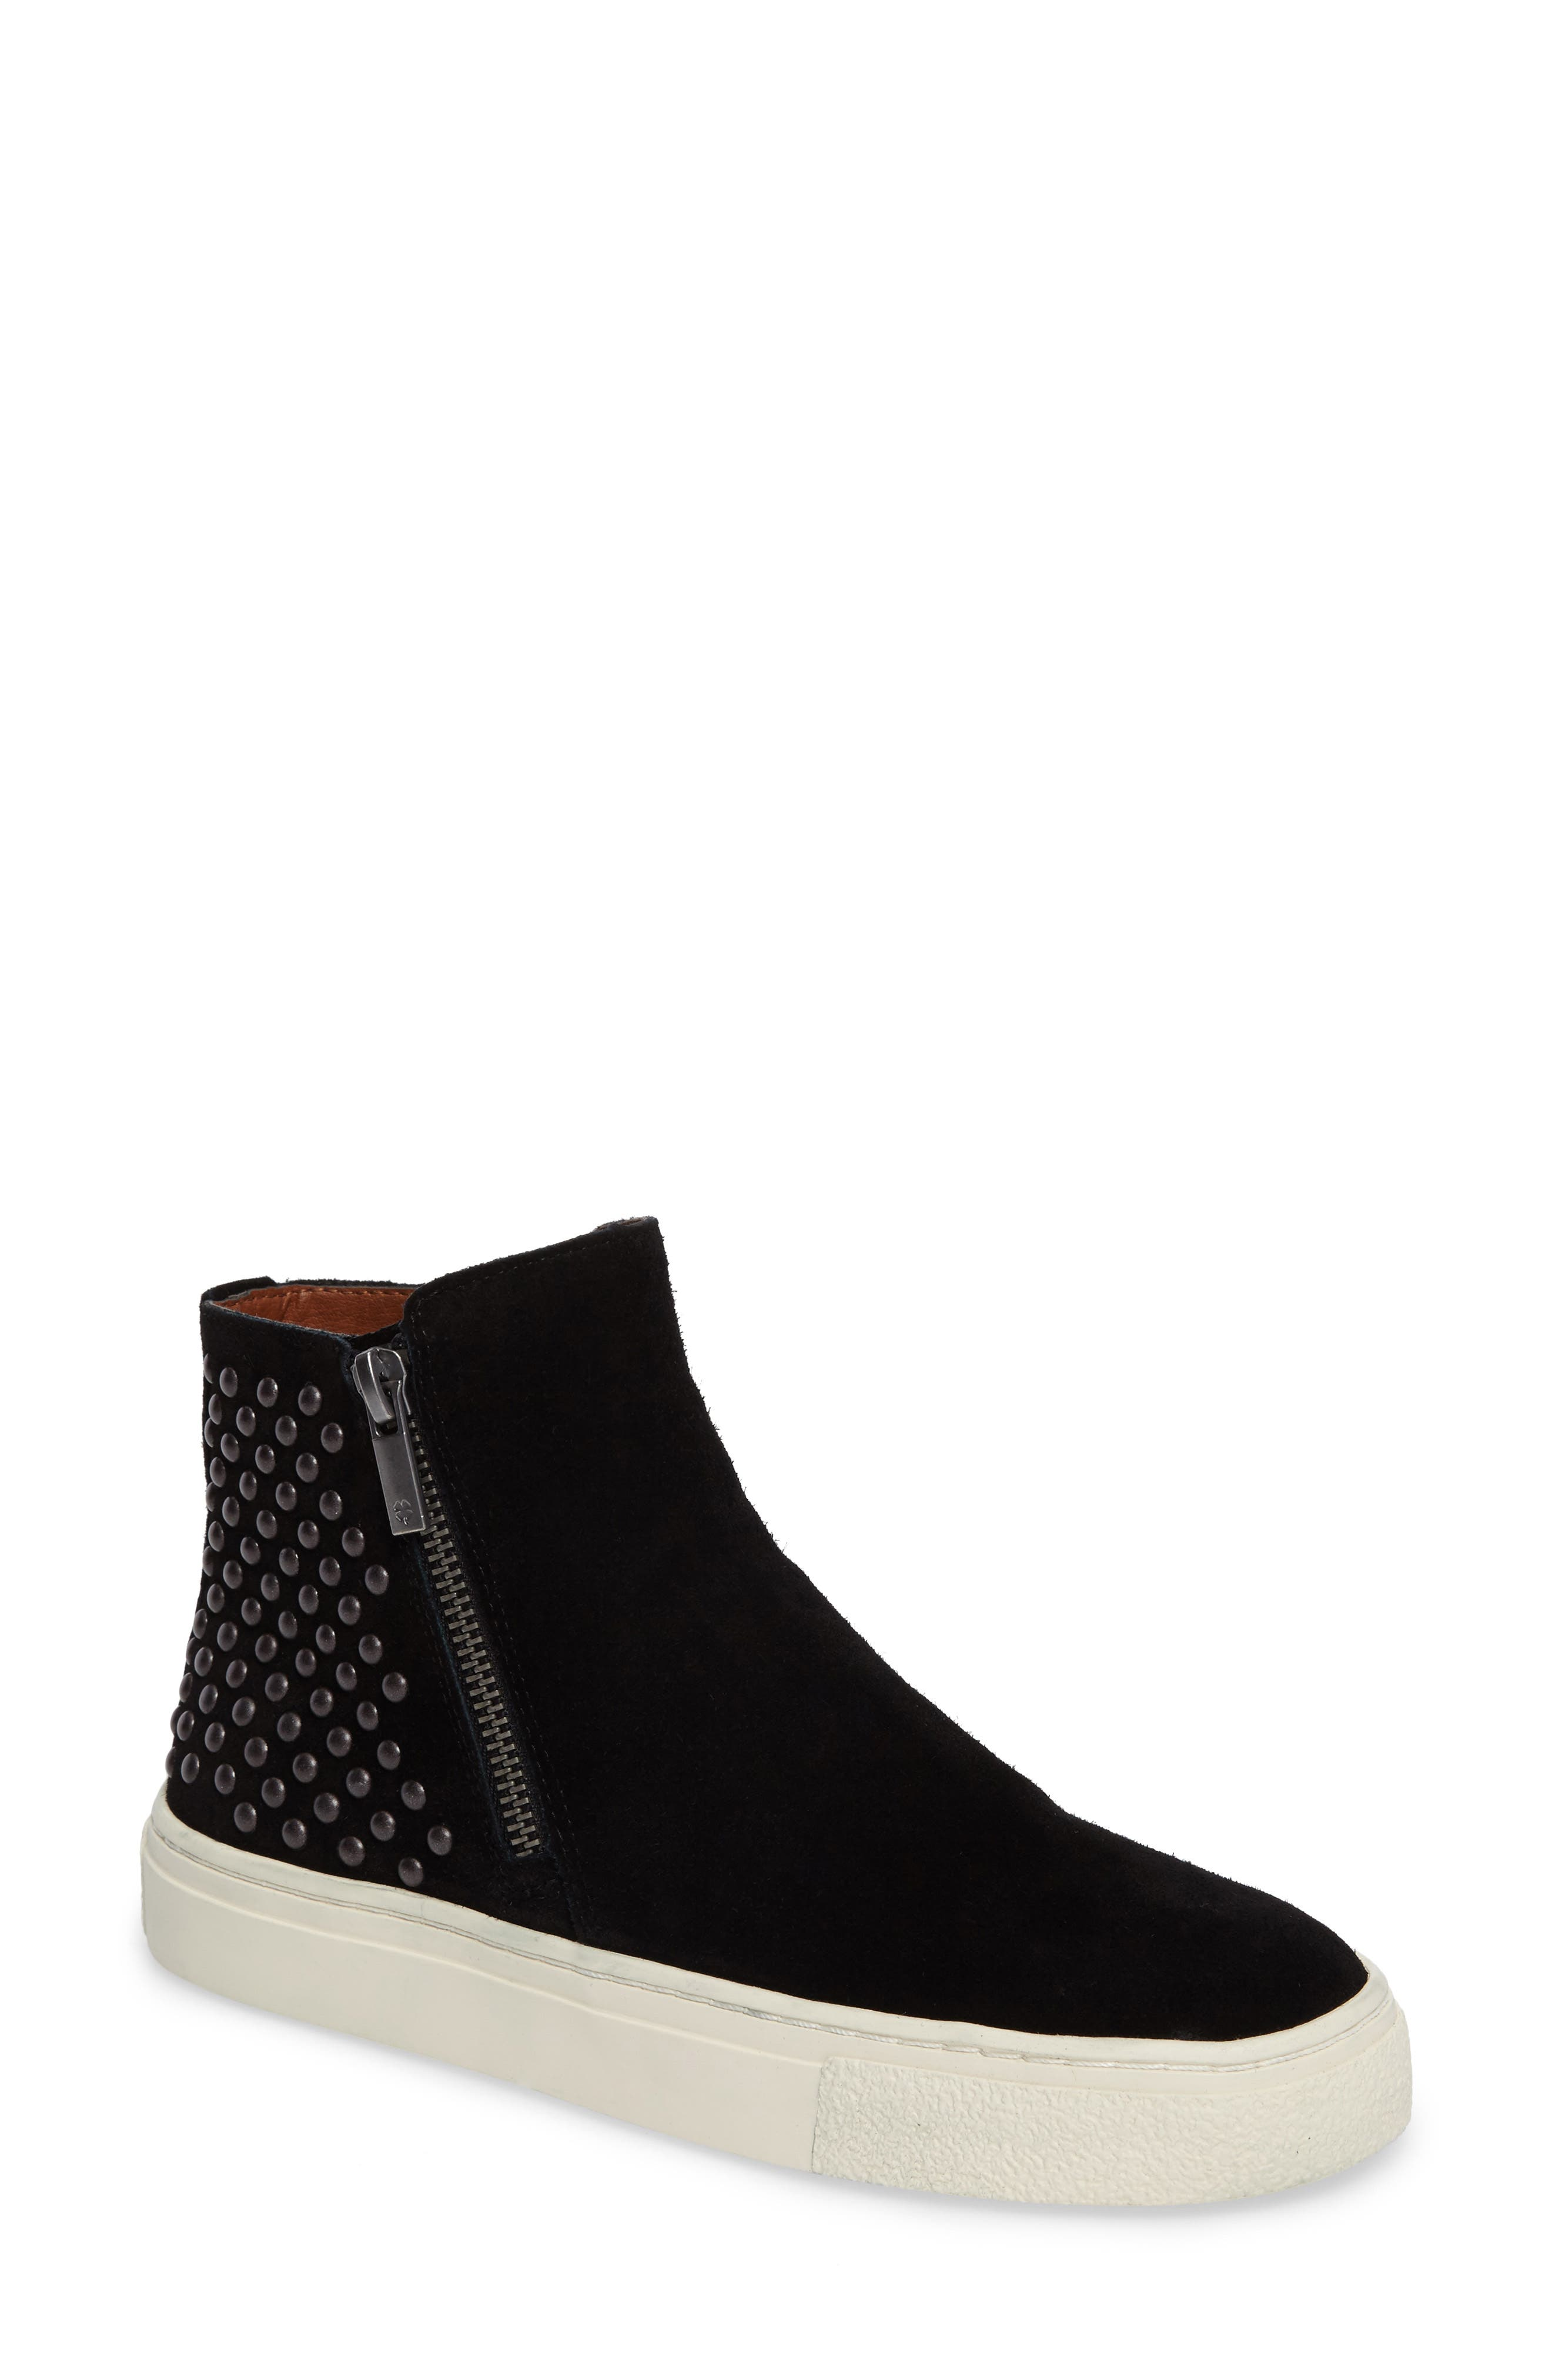 Bayleah High Top Sneaker,                         Main,                         color, 001